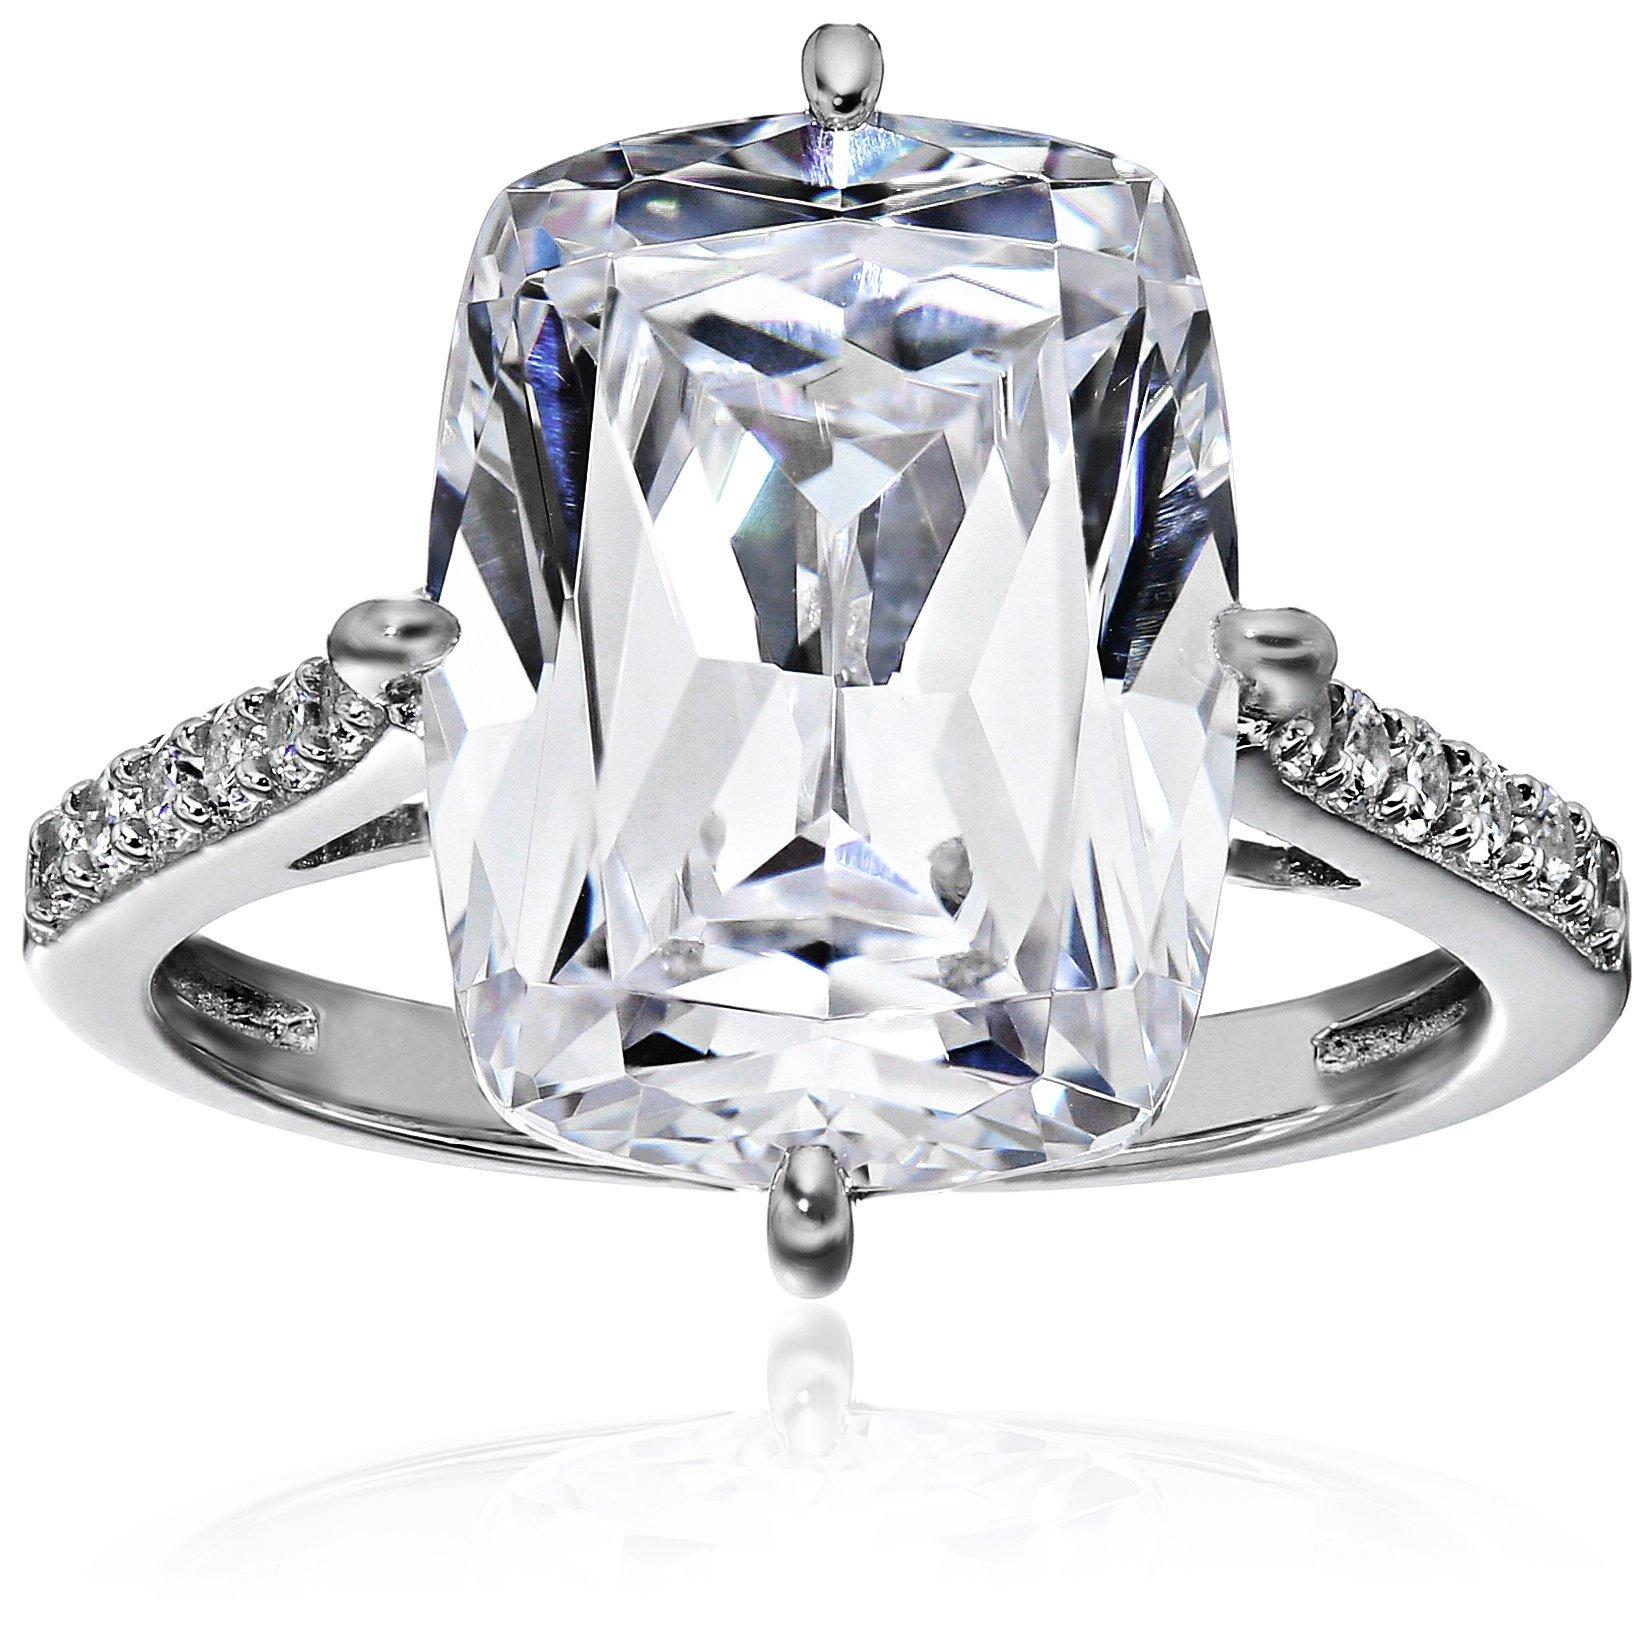 Platinum Plated Sterling Silver Celebrity ''Kim'' Ring made with Swarovski Zirconia, Size 7